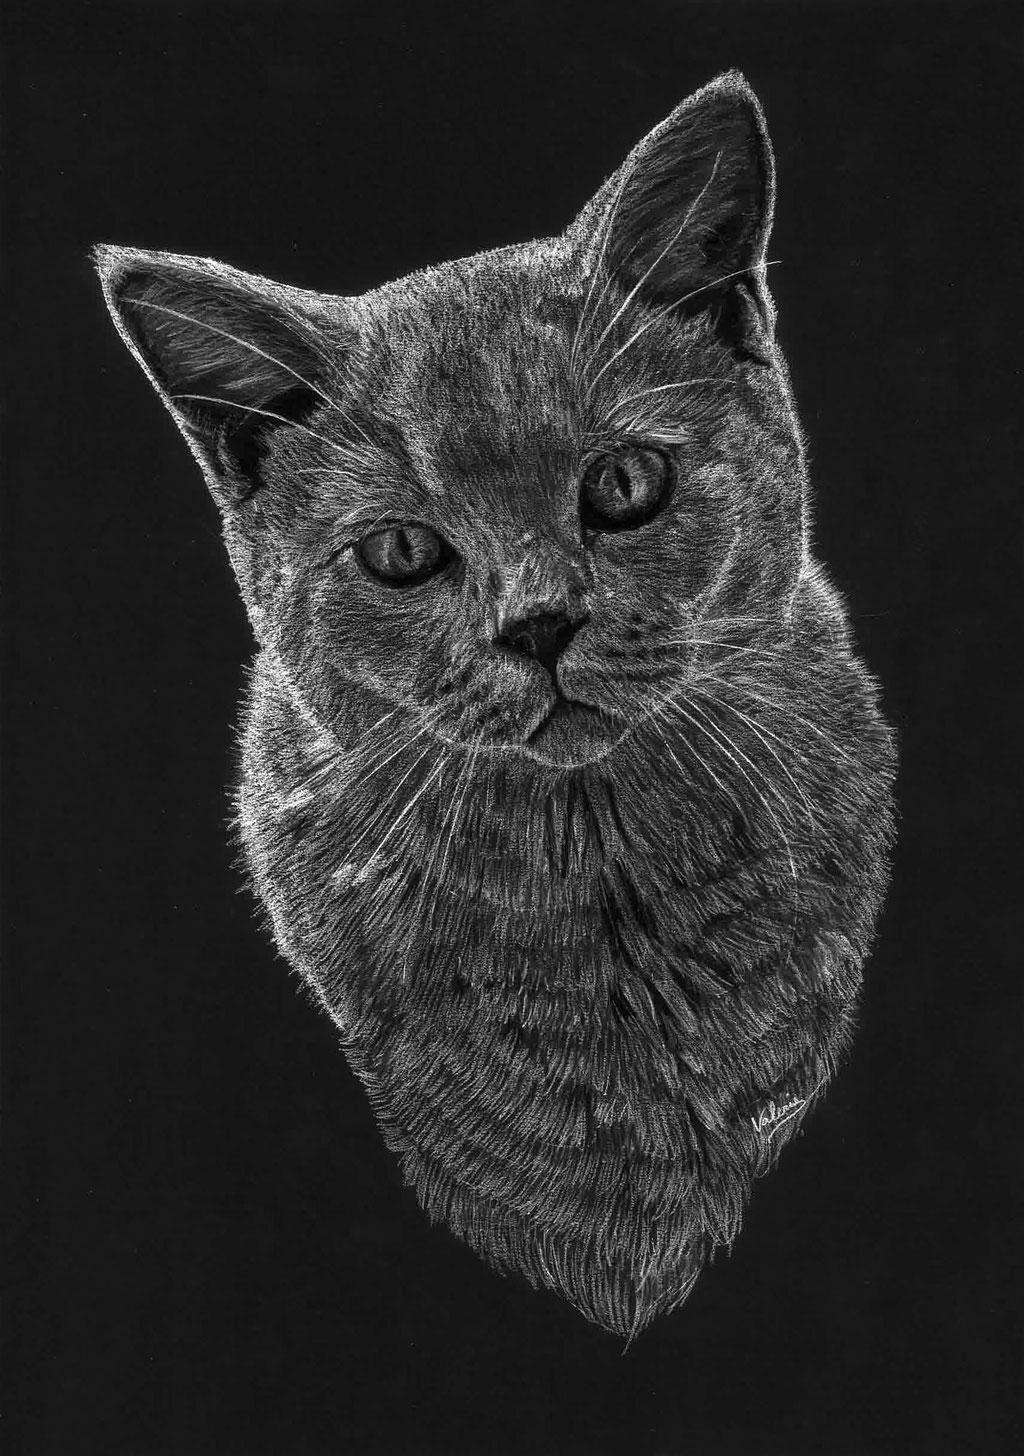 Dierenportret grijze kat: Wit potlood op zwart papier (2018)